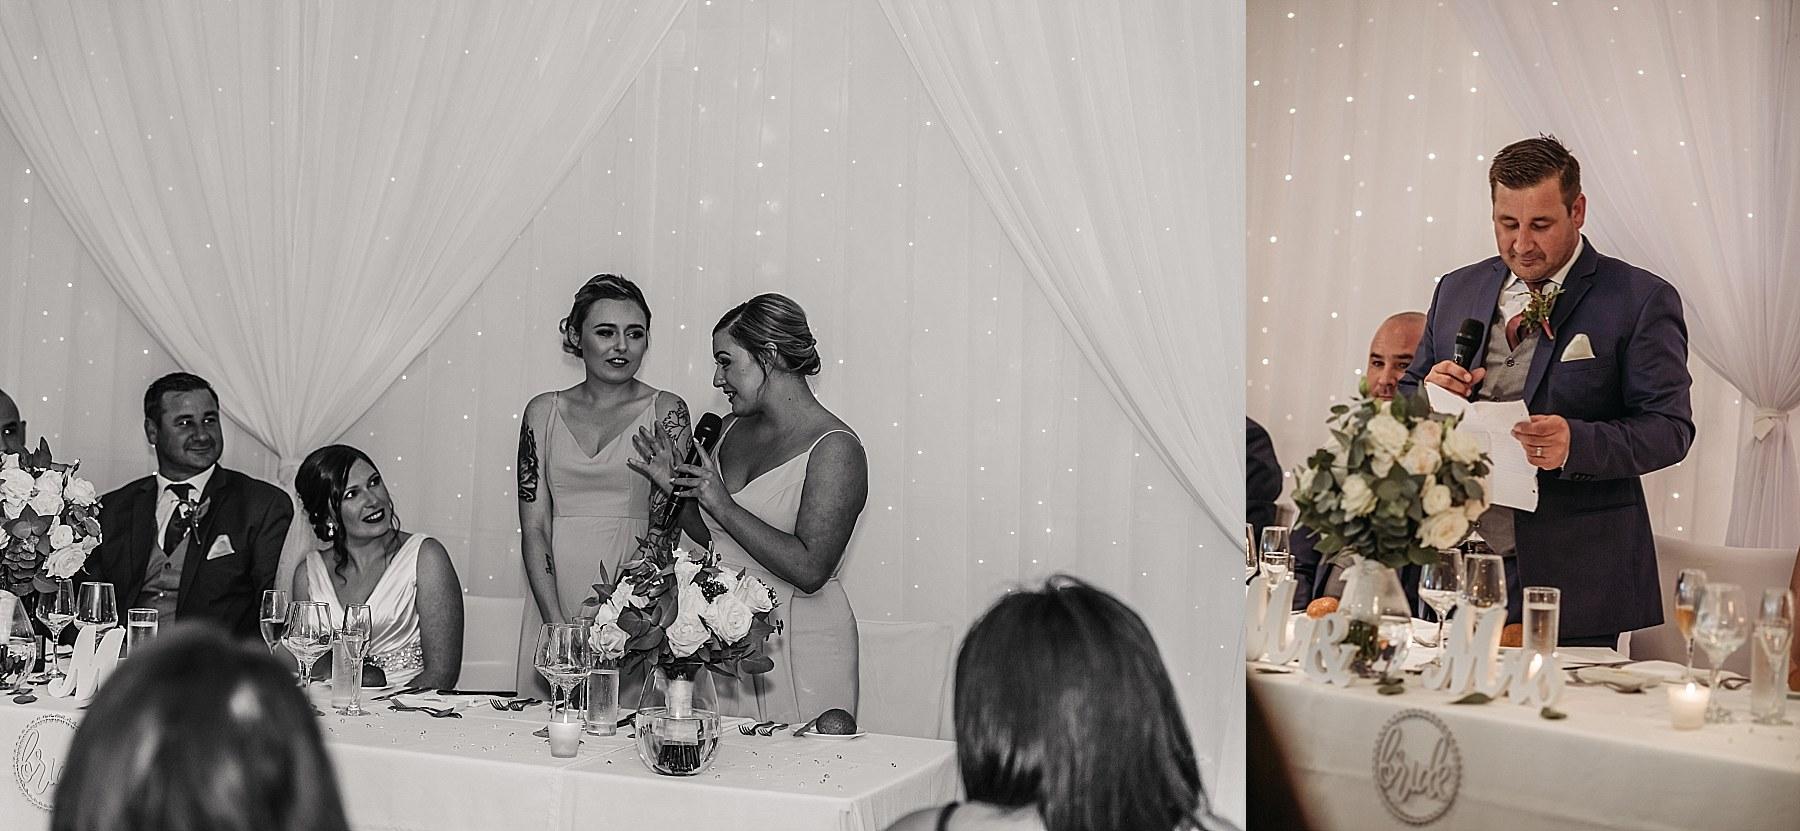 Allely Estate Wedding Auckland Wedding Photographer - Jana & Laurie_0199.jpg